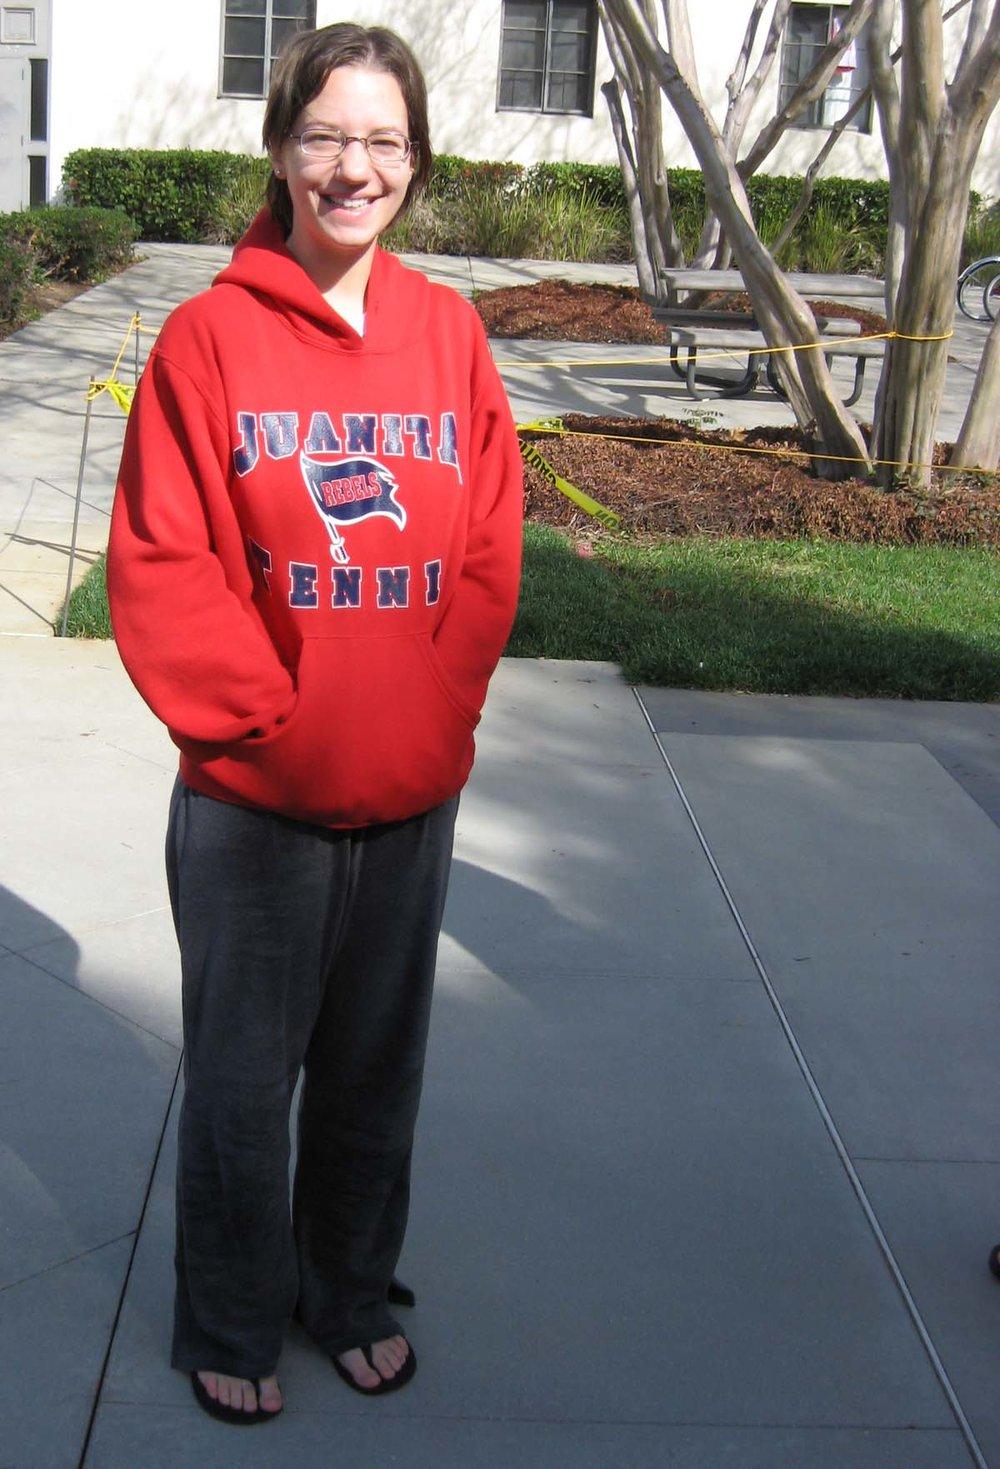 Juanita High School grad at Pomona College